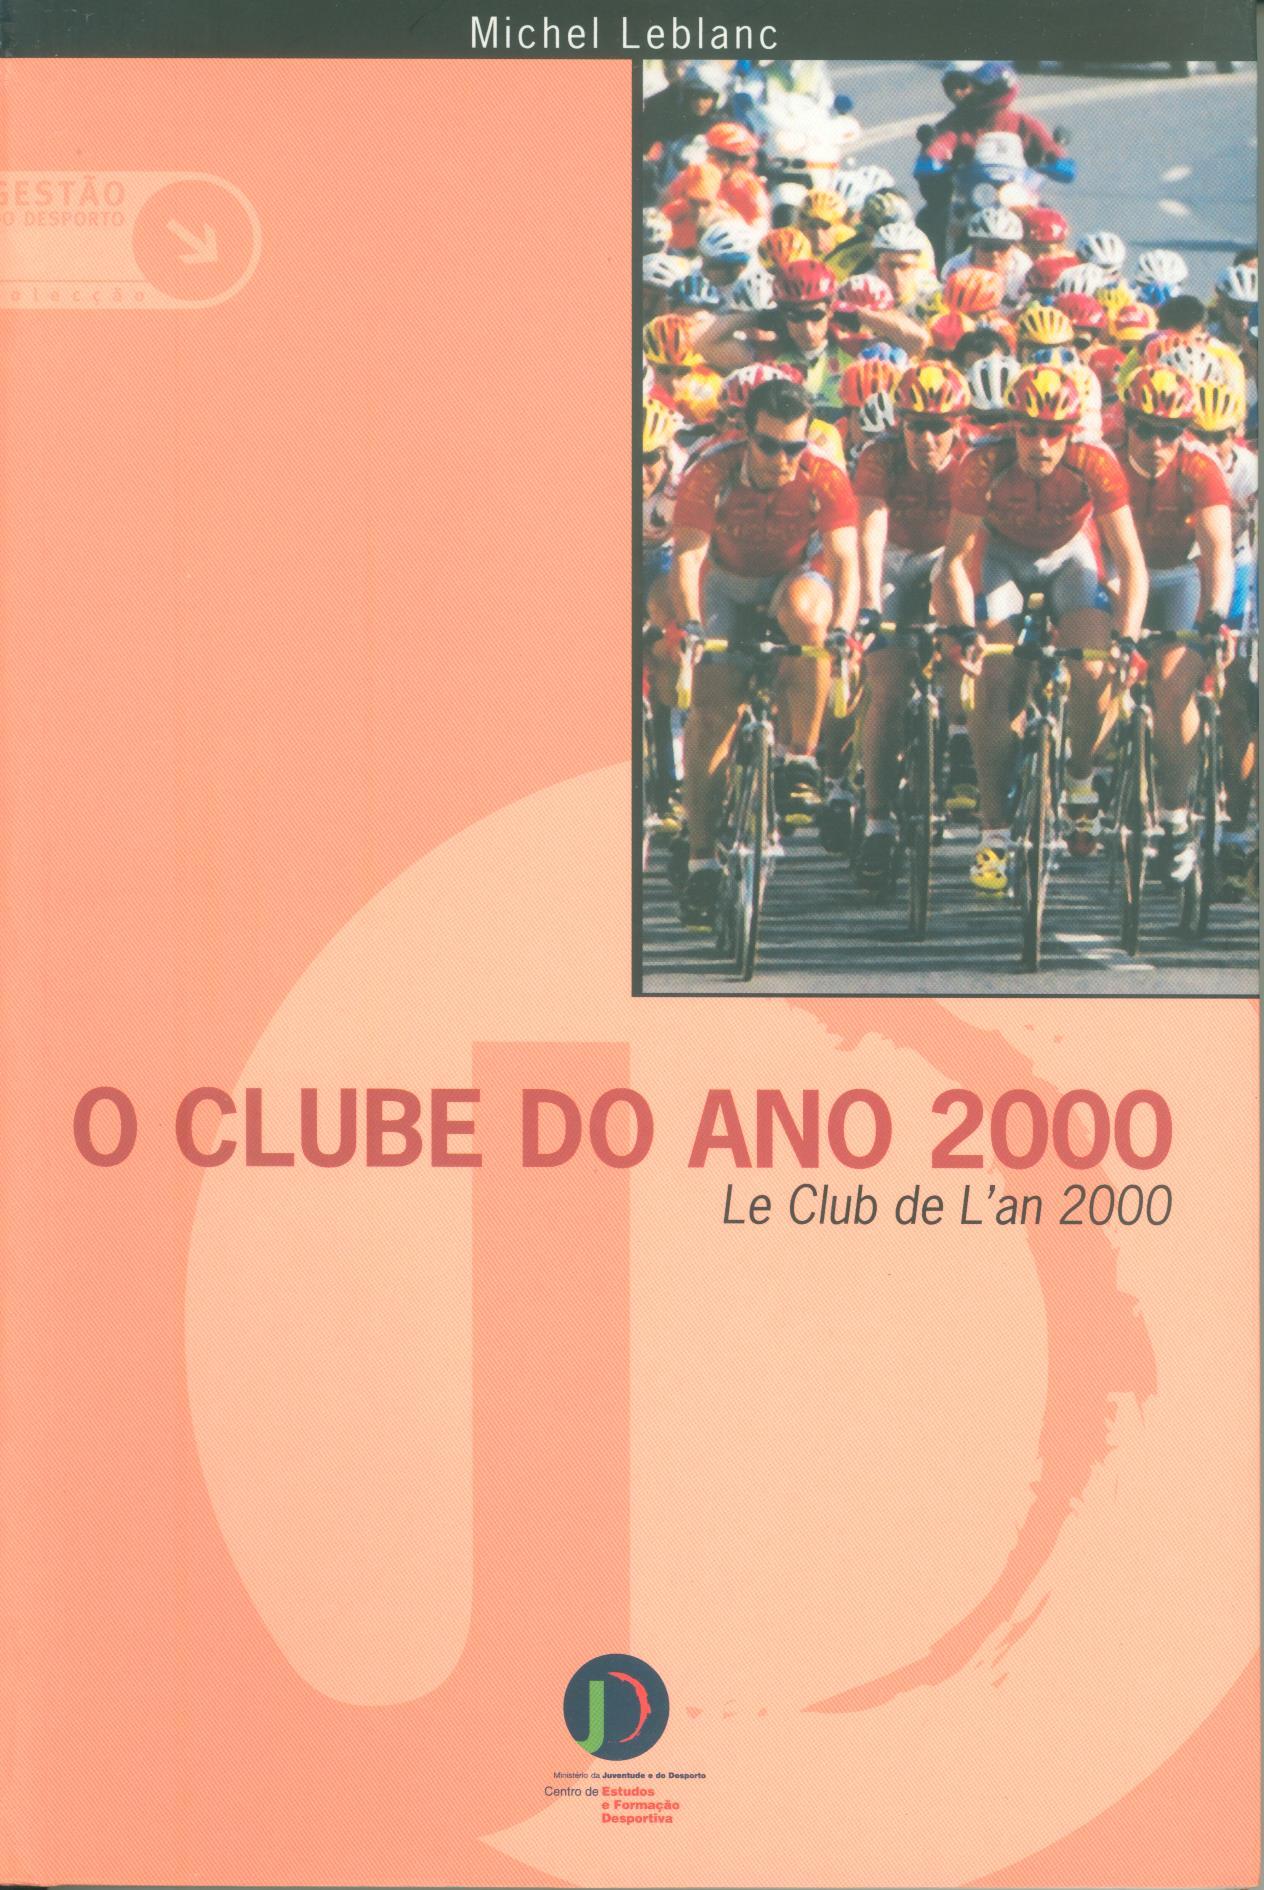 O Clube do Ano 2000